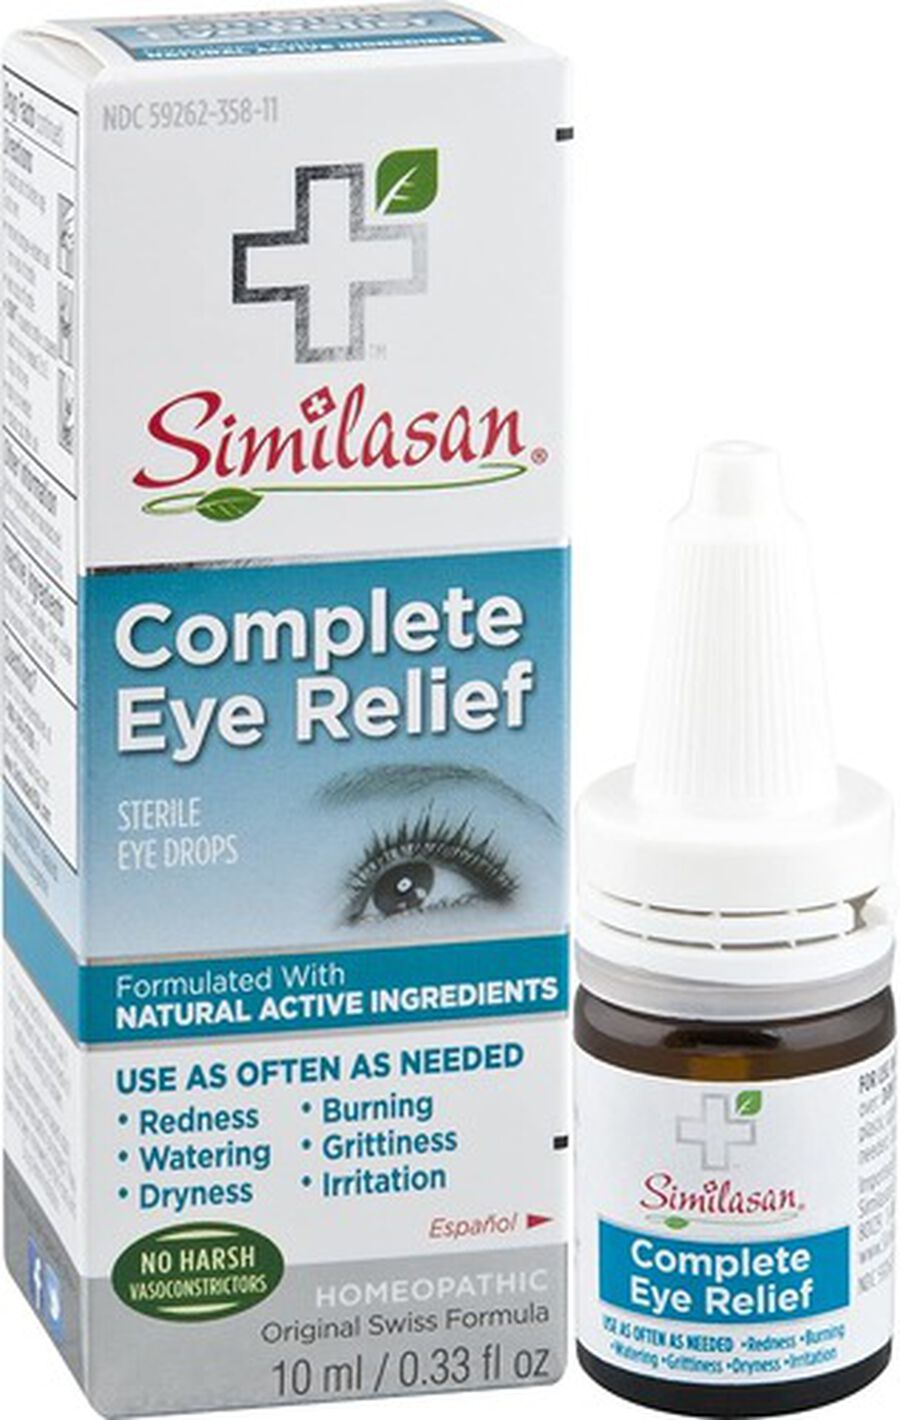 Similasan Complete Eye Relief, 0.33 fl. oz., , large image number 3